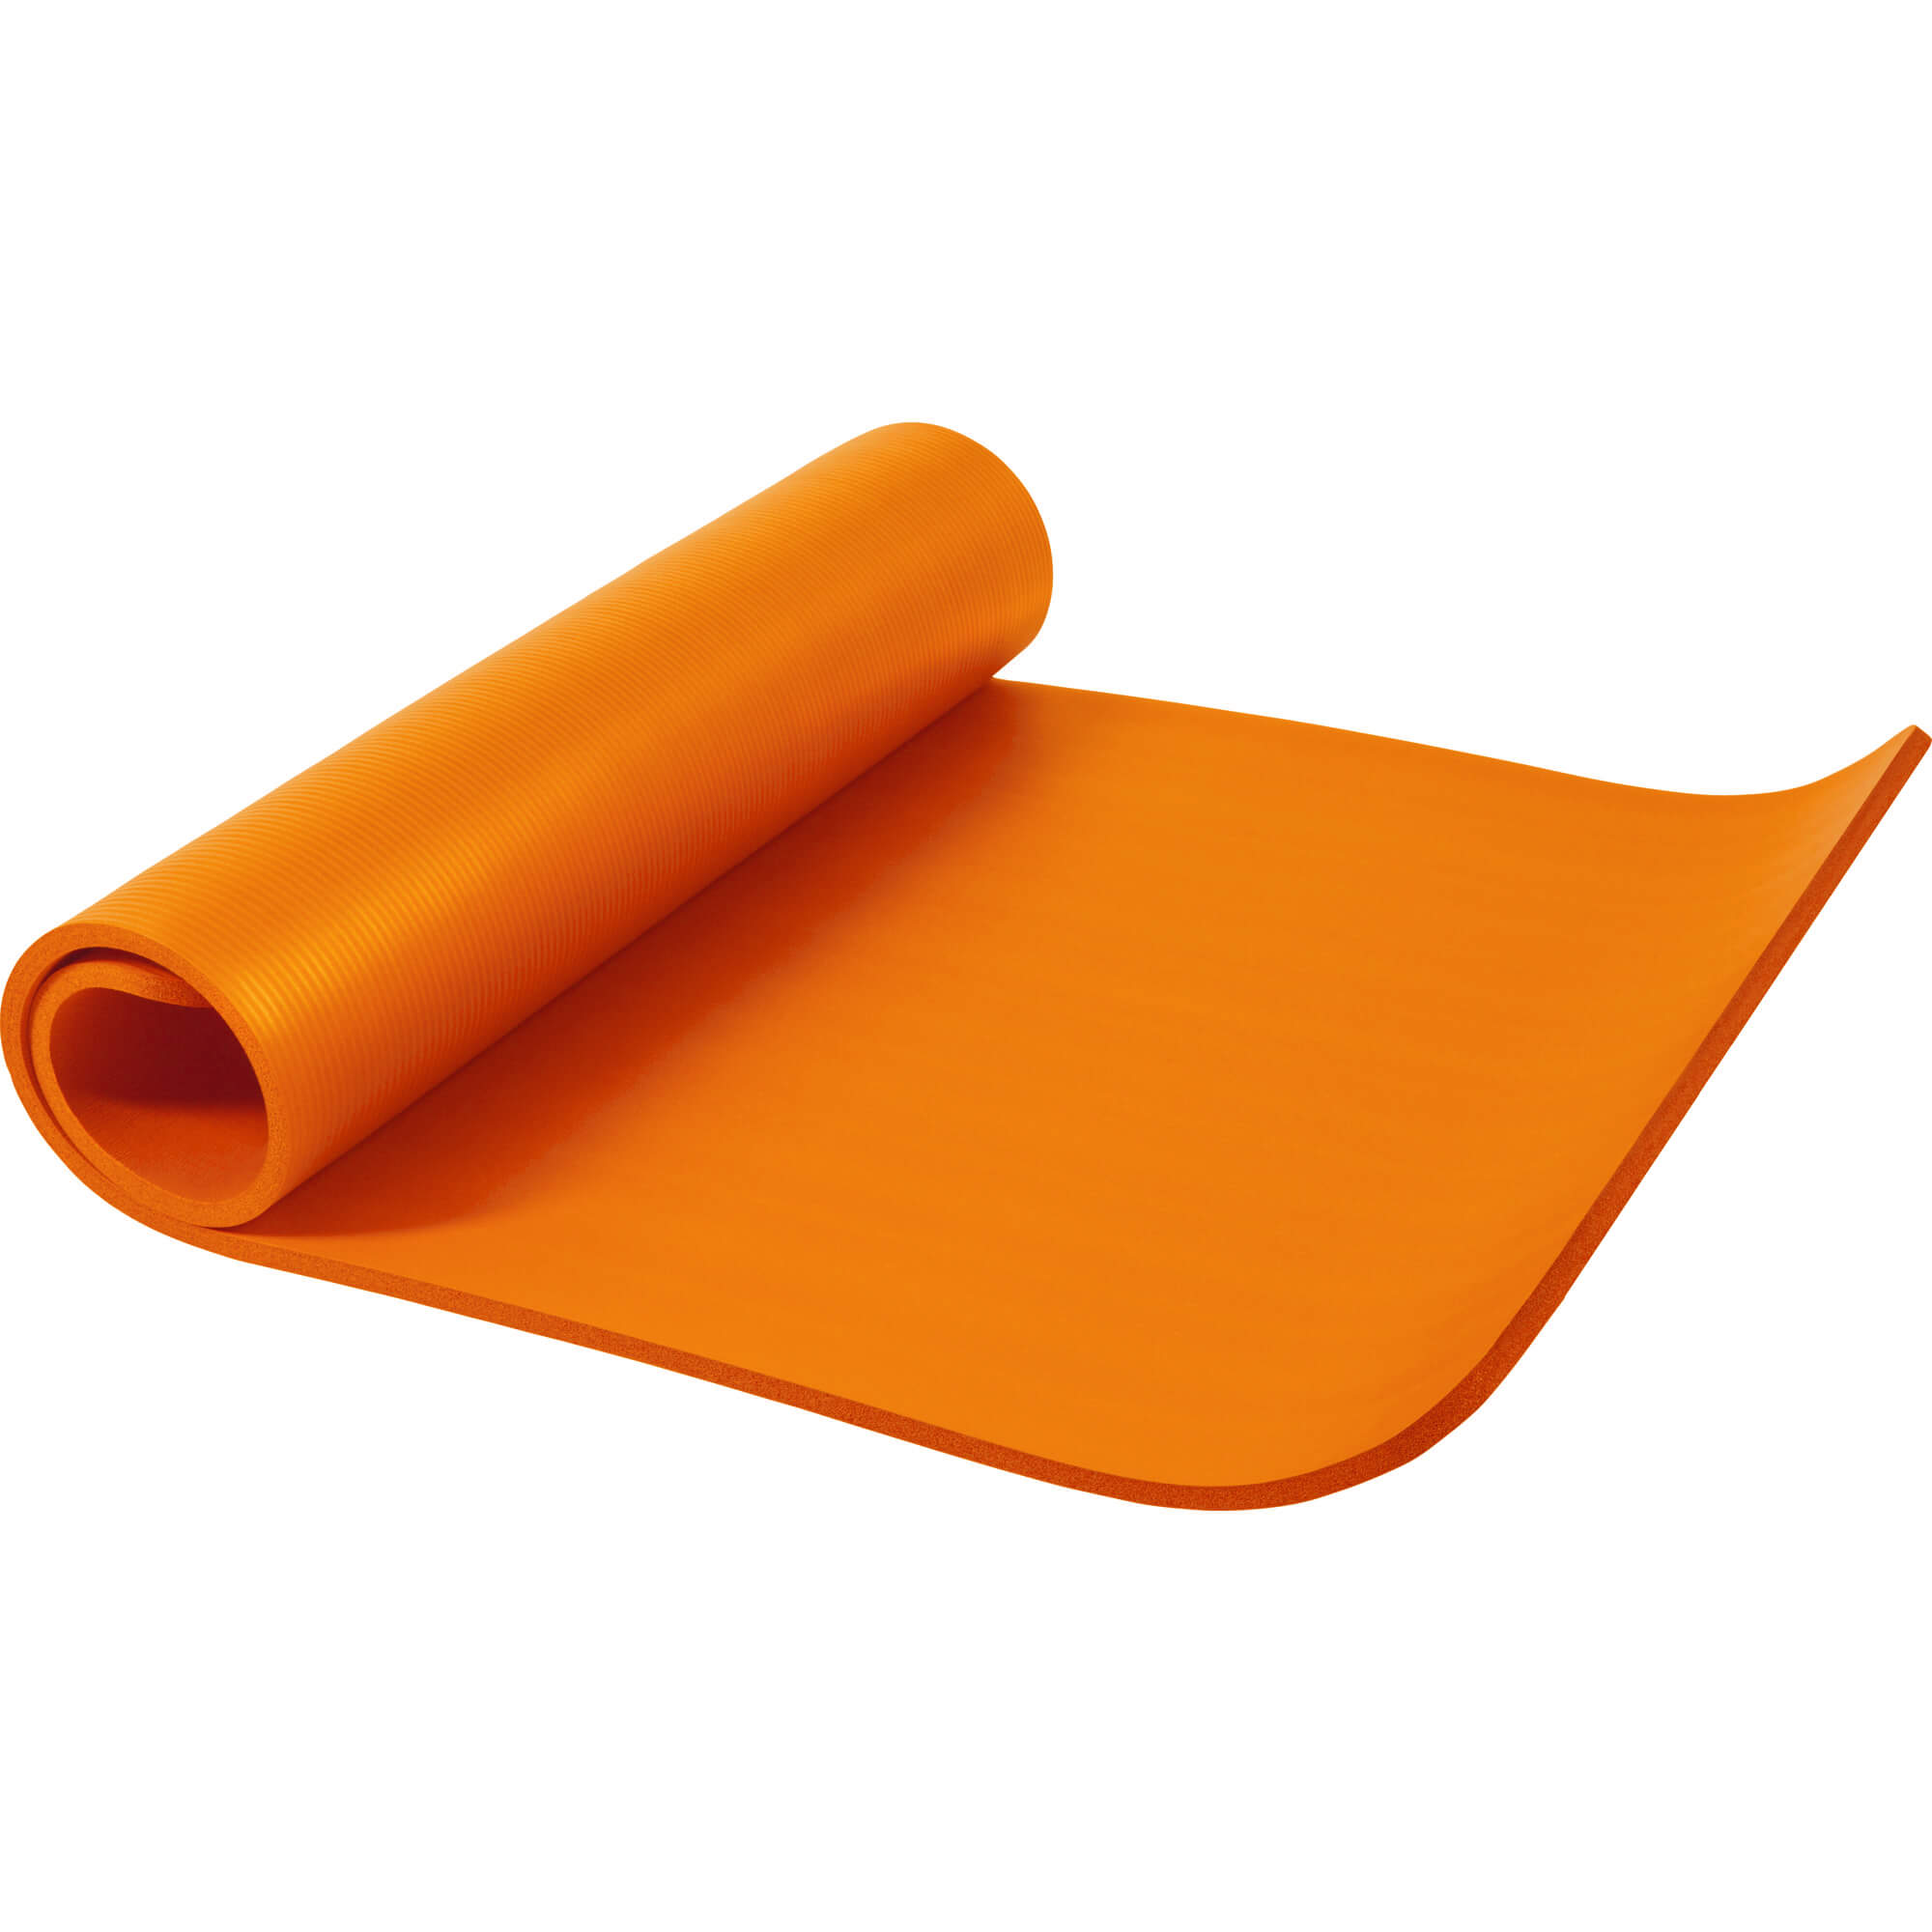 Yogamatte Orange 190 x 100 x 1,5 cm